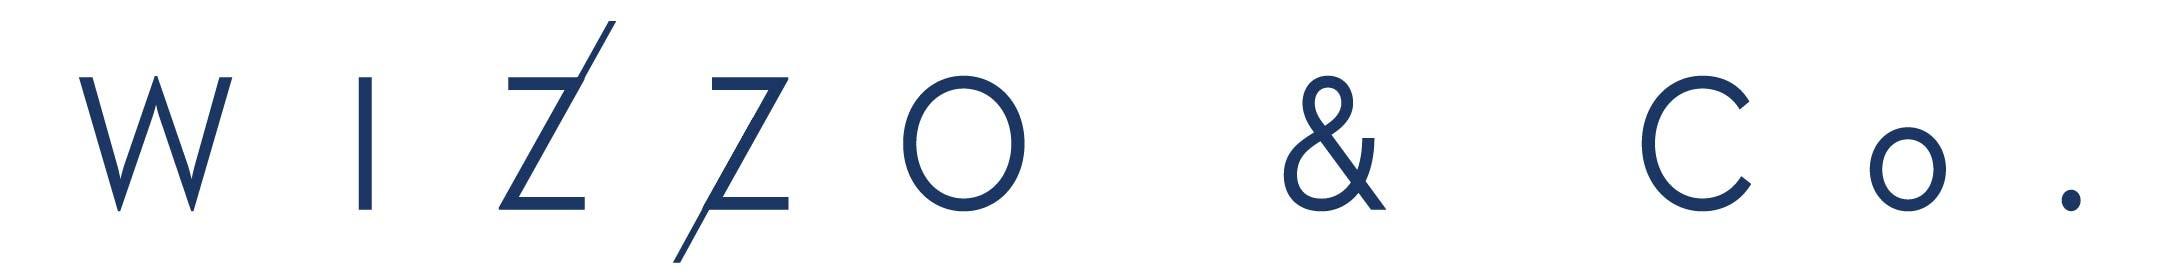 Logo+1.jpg